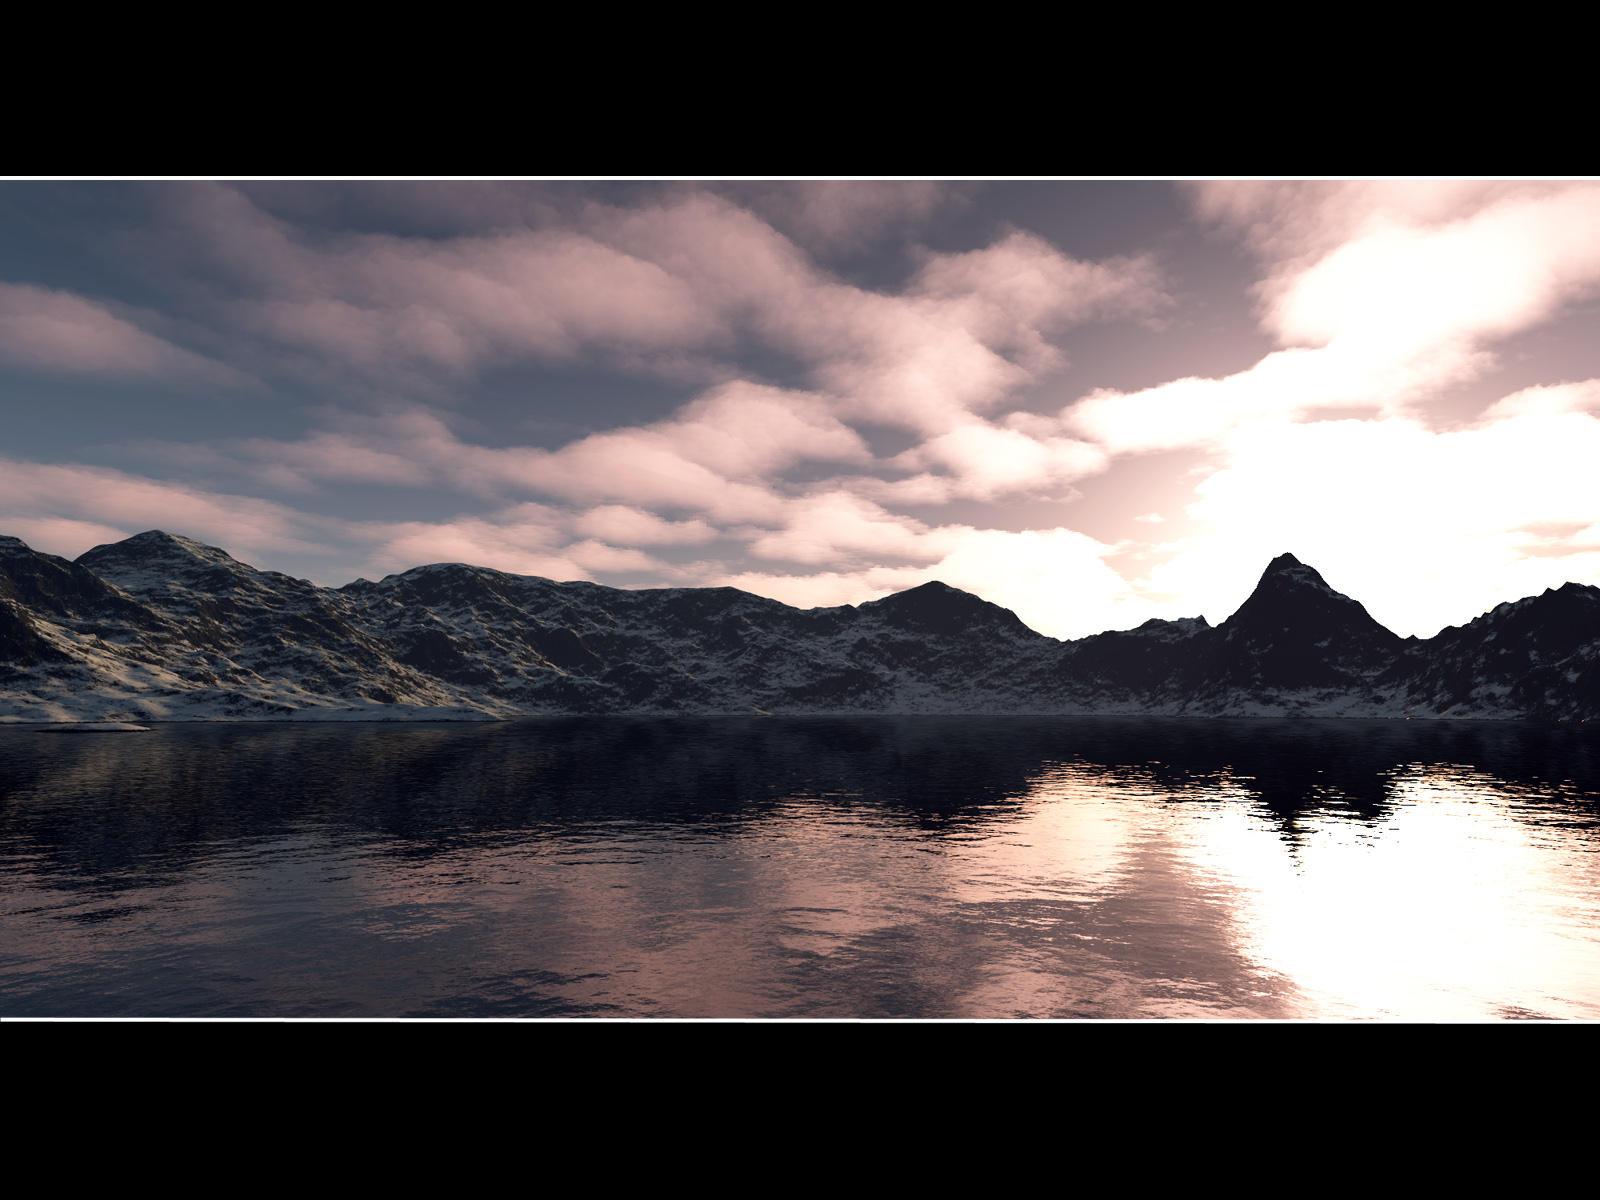 Calm - Terragen by furryphotos